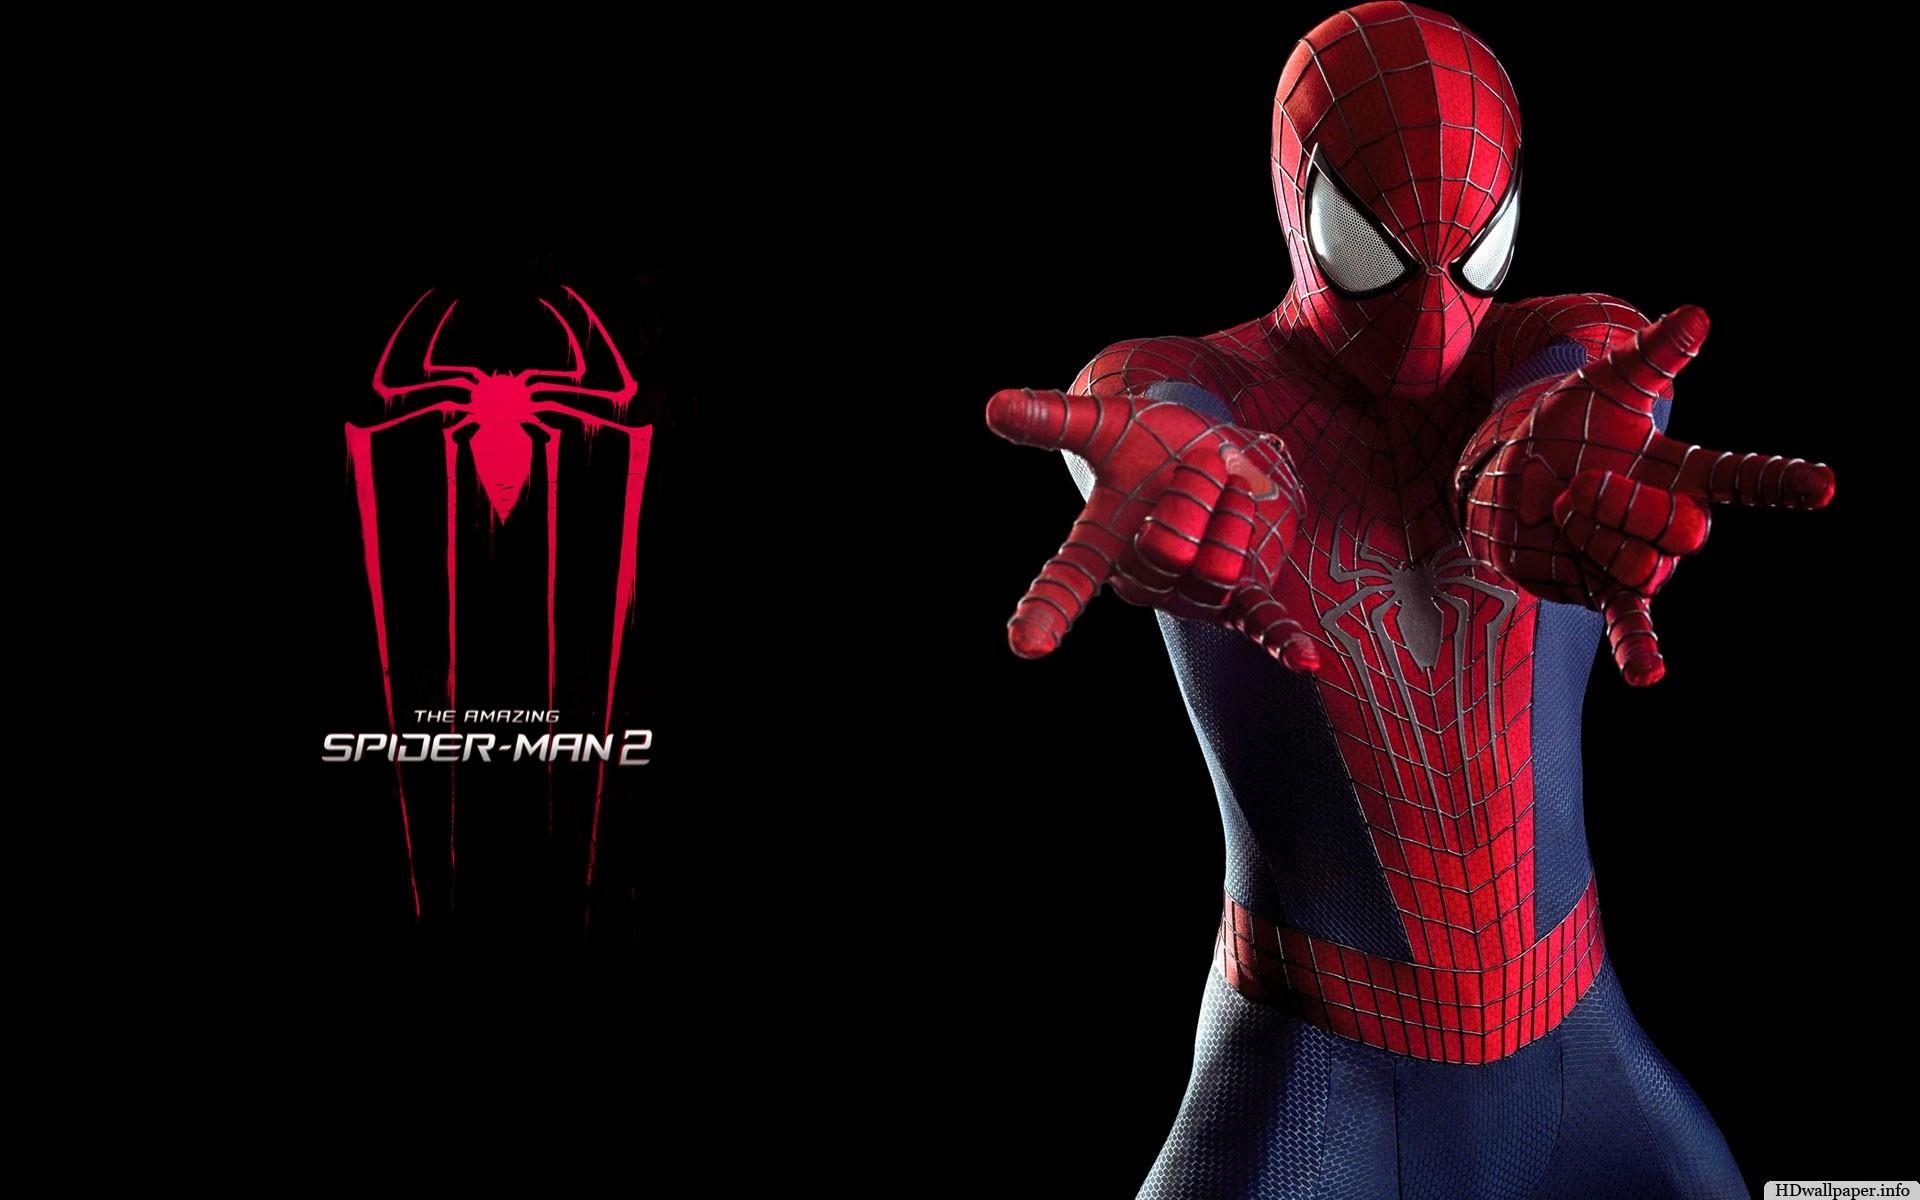 The Amazing Spider Man 2 Wallpaper Hd